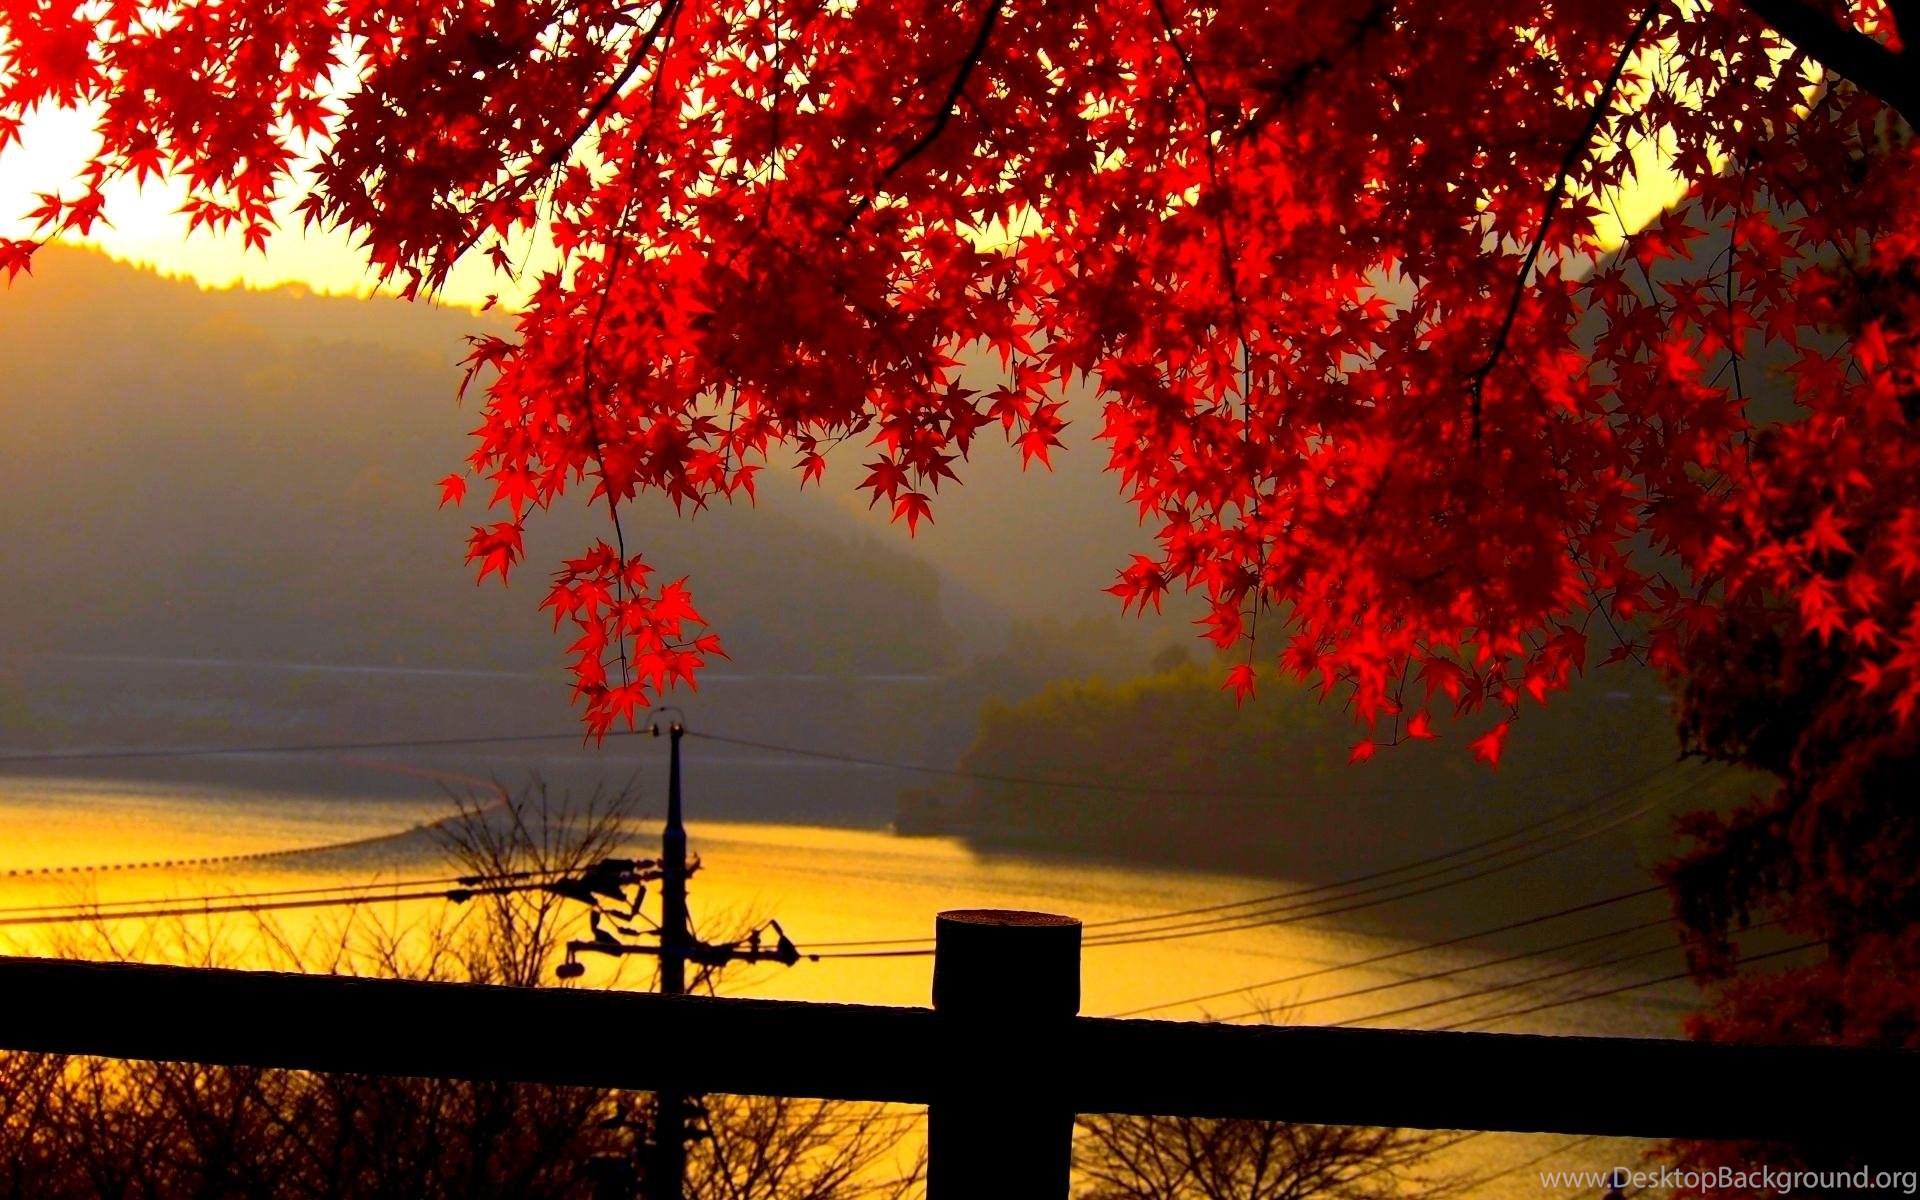 Autumn Leaves Stream Wallpapers Hd Desktop Wallpapers Desktop Background